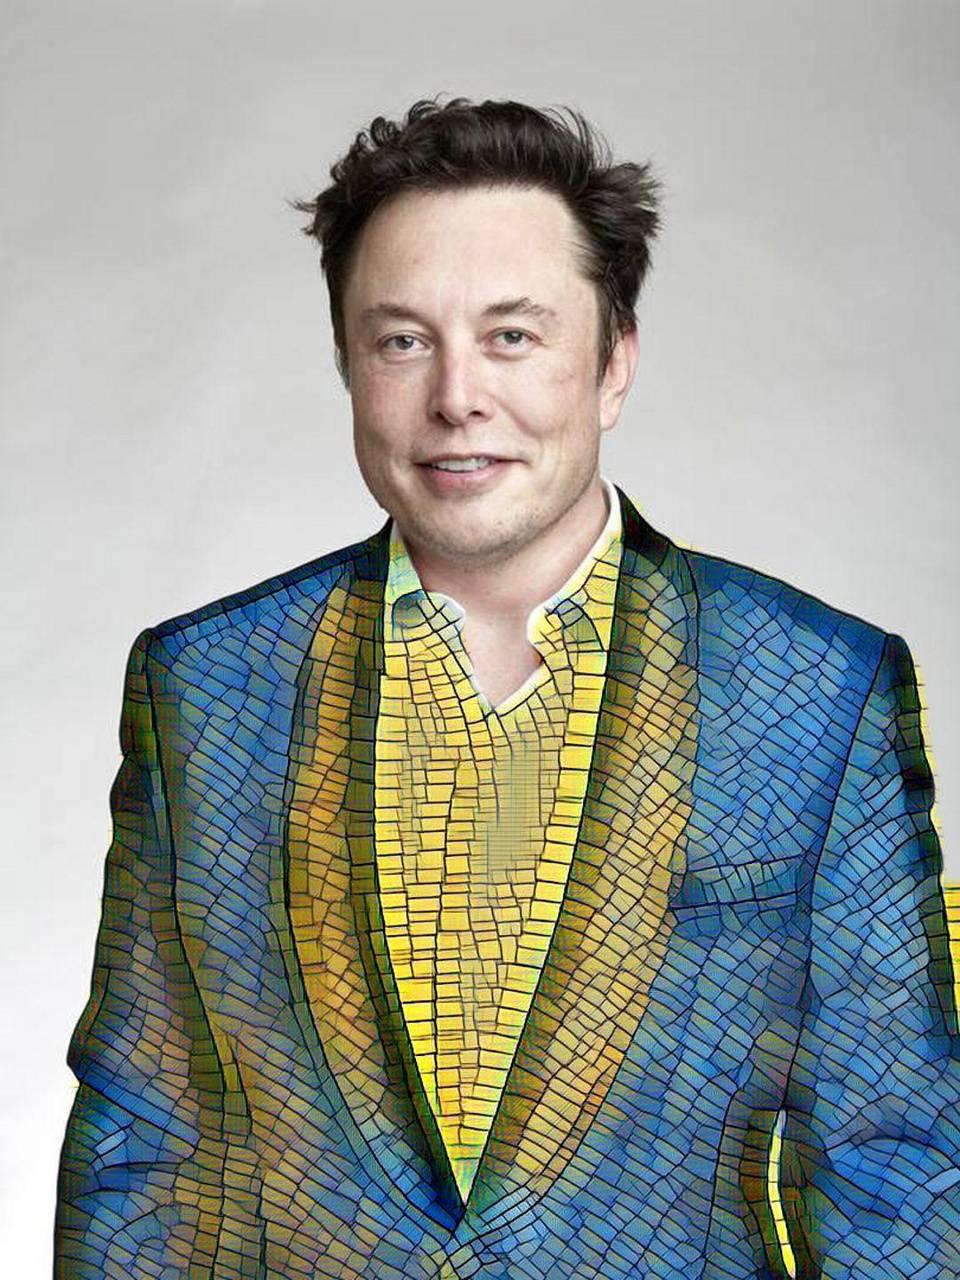 Elon Musk Wallpaper By Theknifehand Ba Free On Zedge